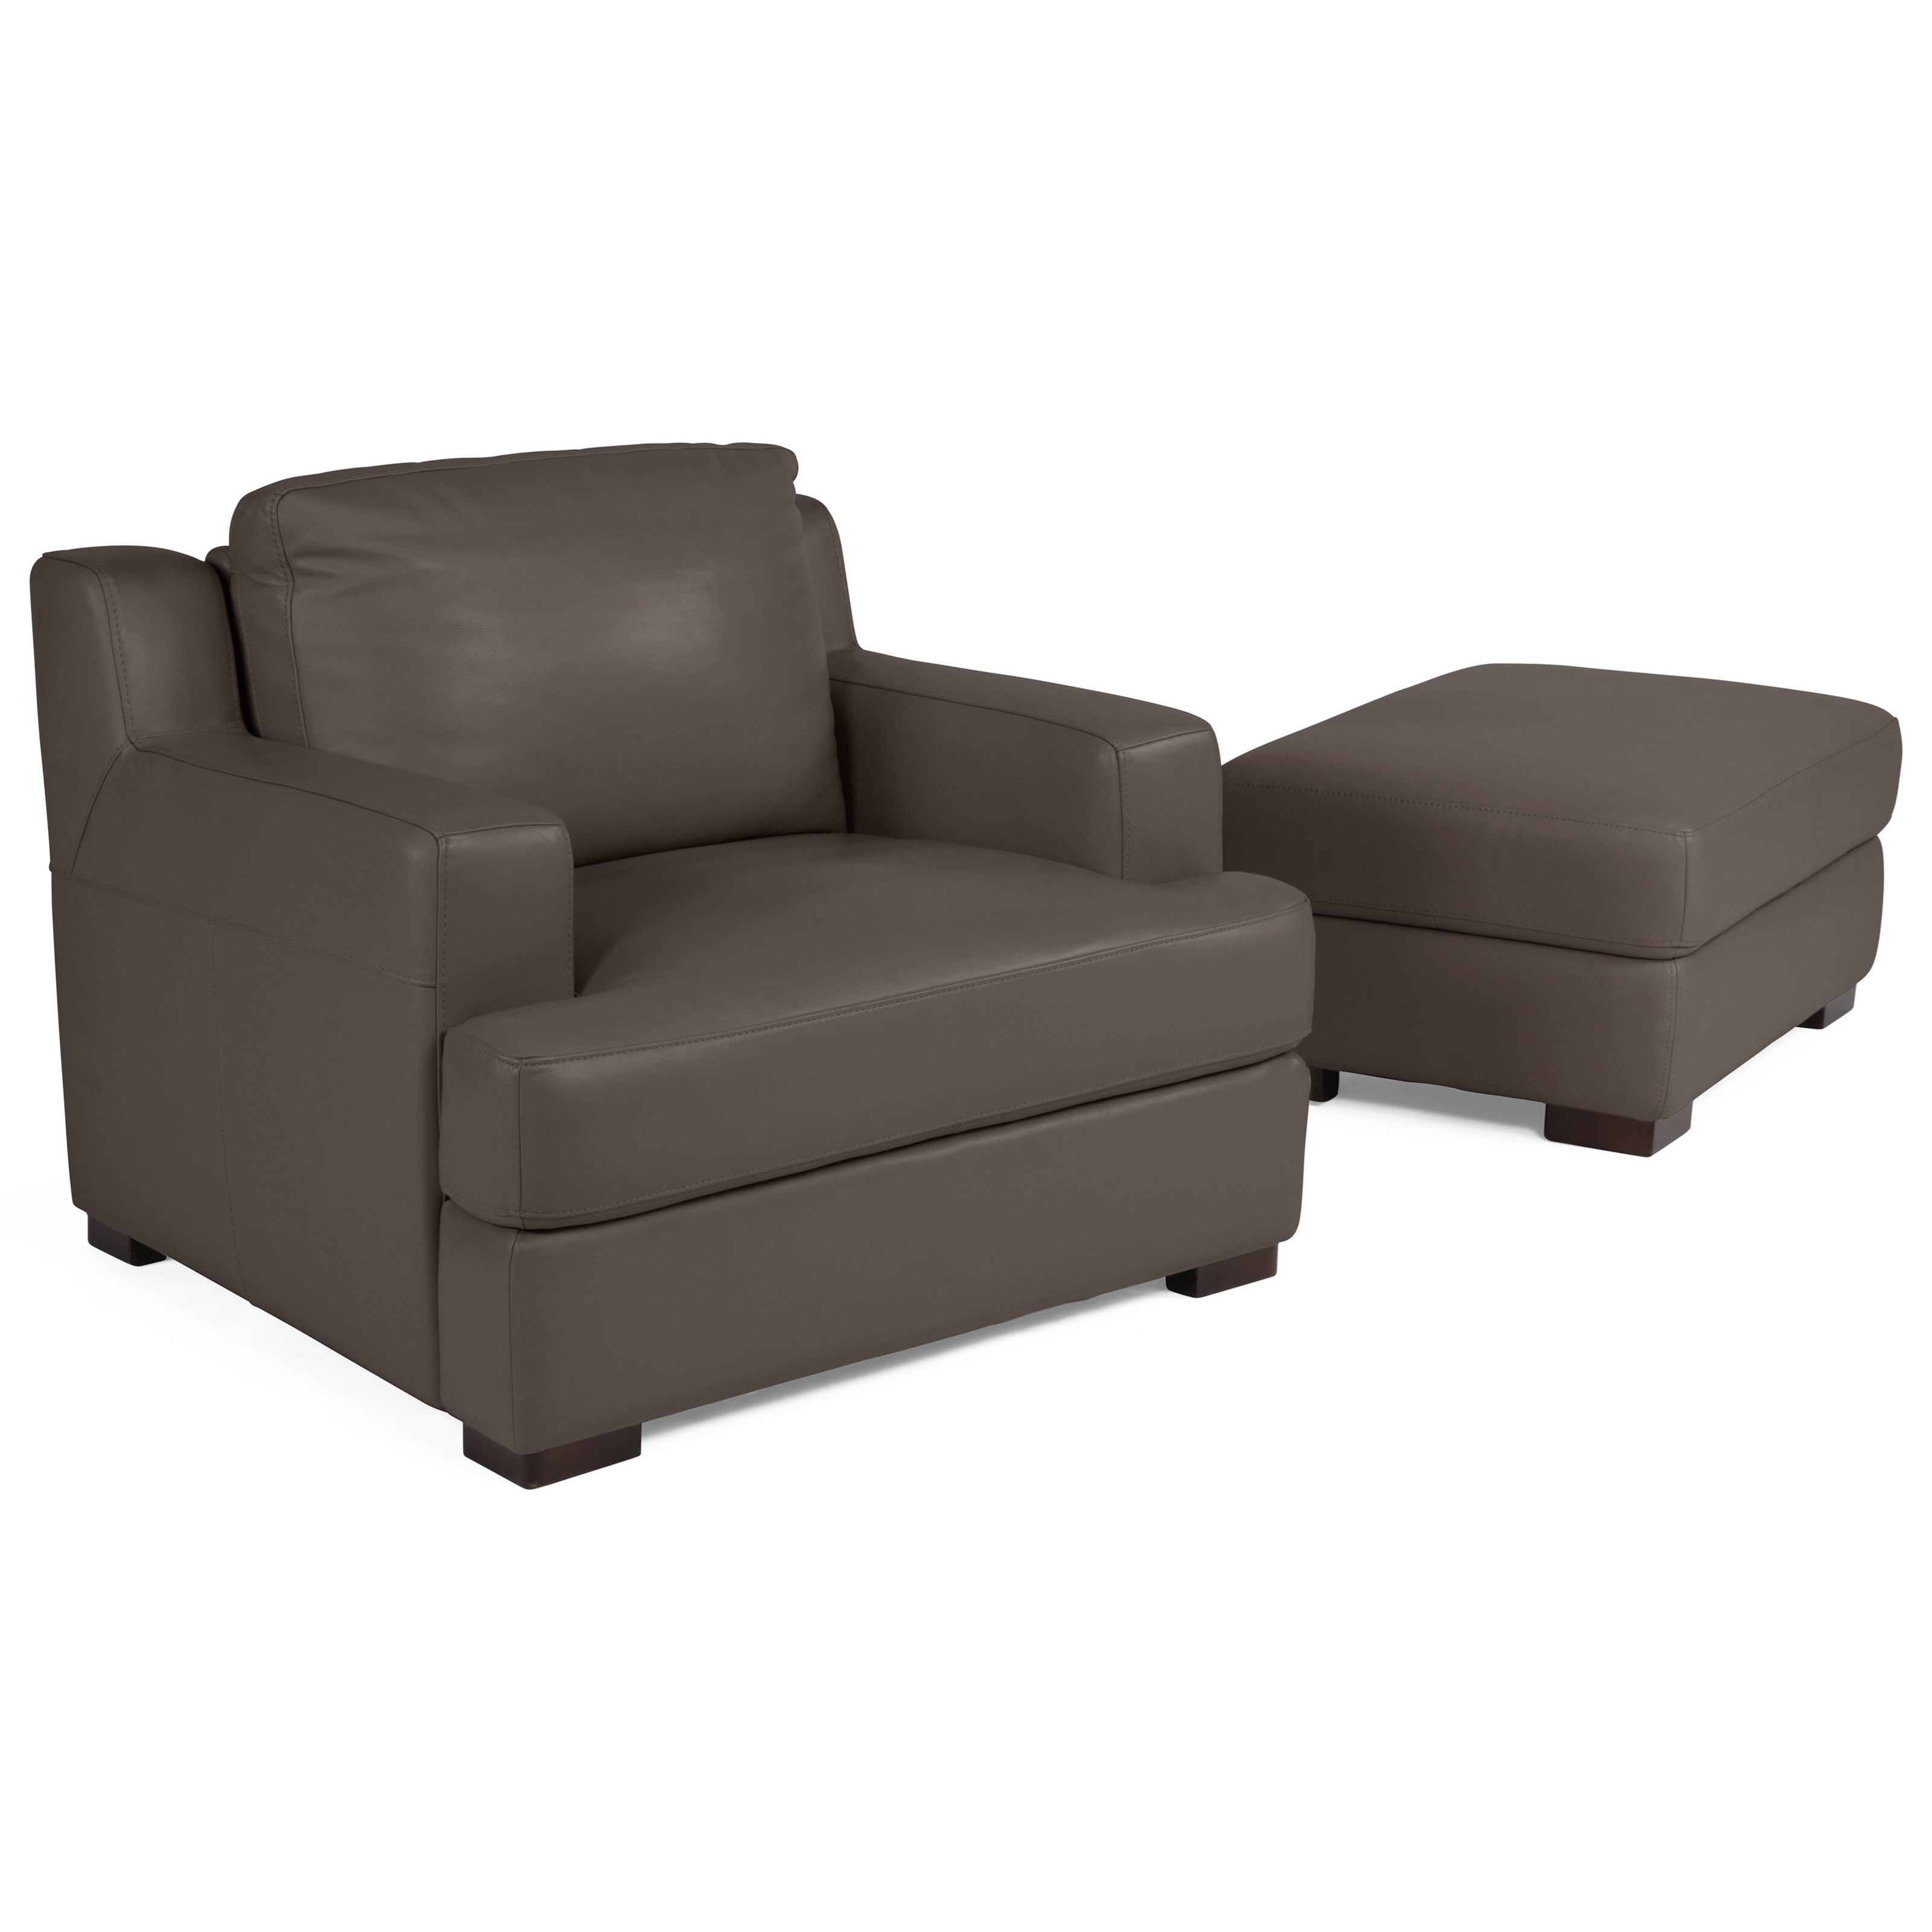 Power Adjustable Back Chair and Ottoman